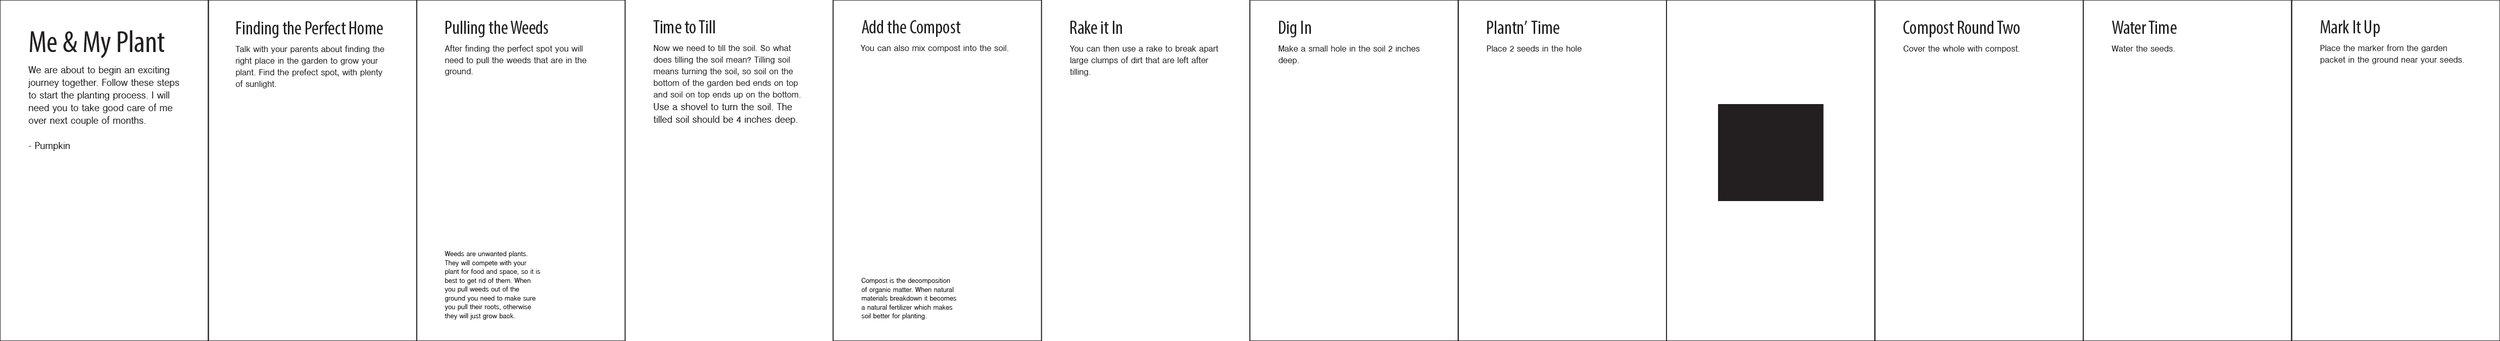 Informational Booklet Plan